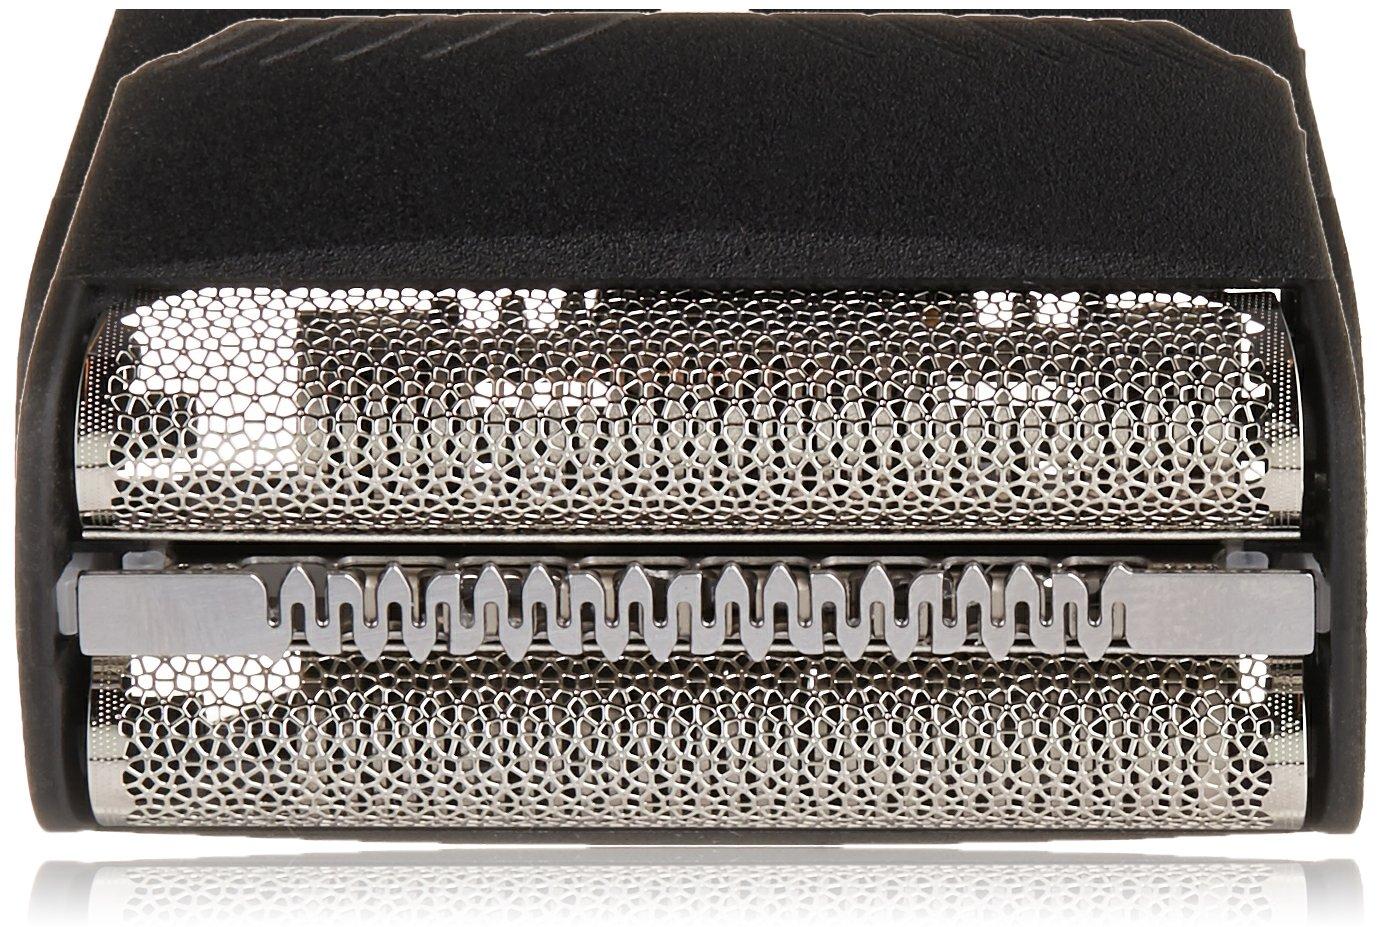 Braun Afeitadora Series 330B Lámina de piezas de repuesto, cabeza reikos_0015940195_005